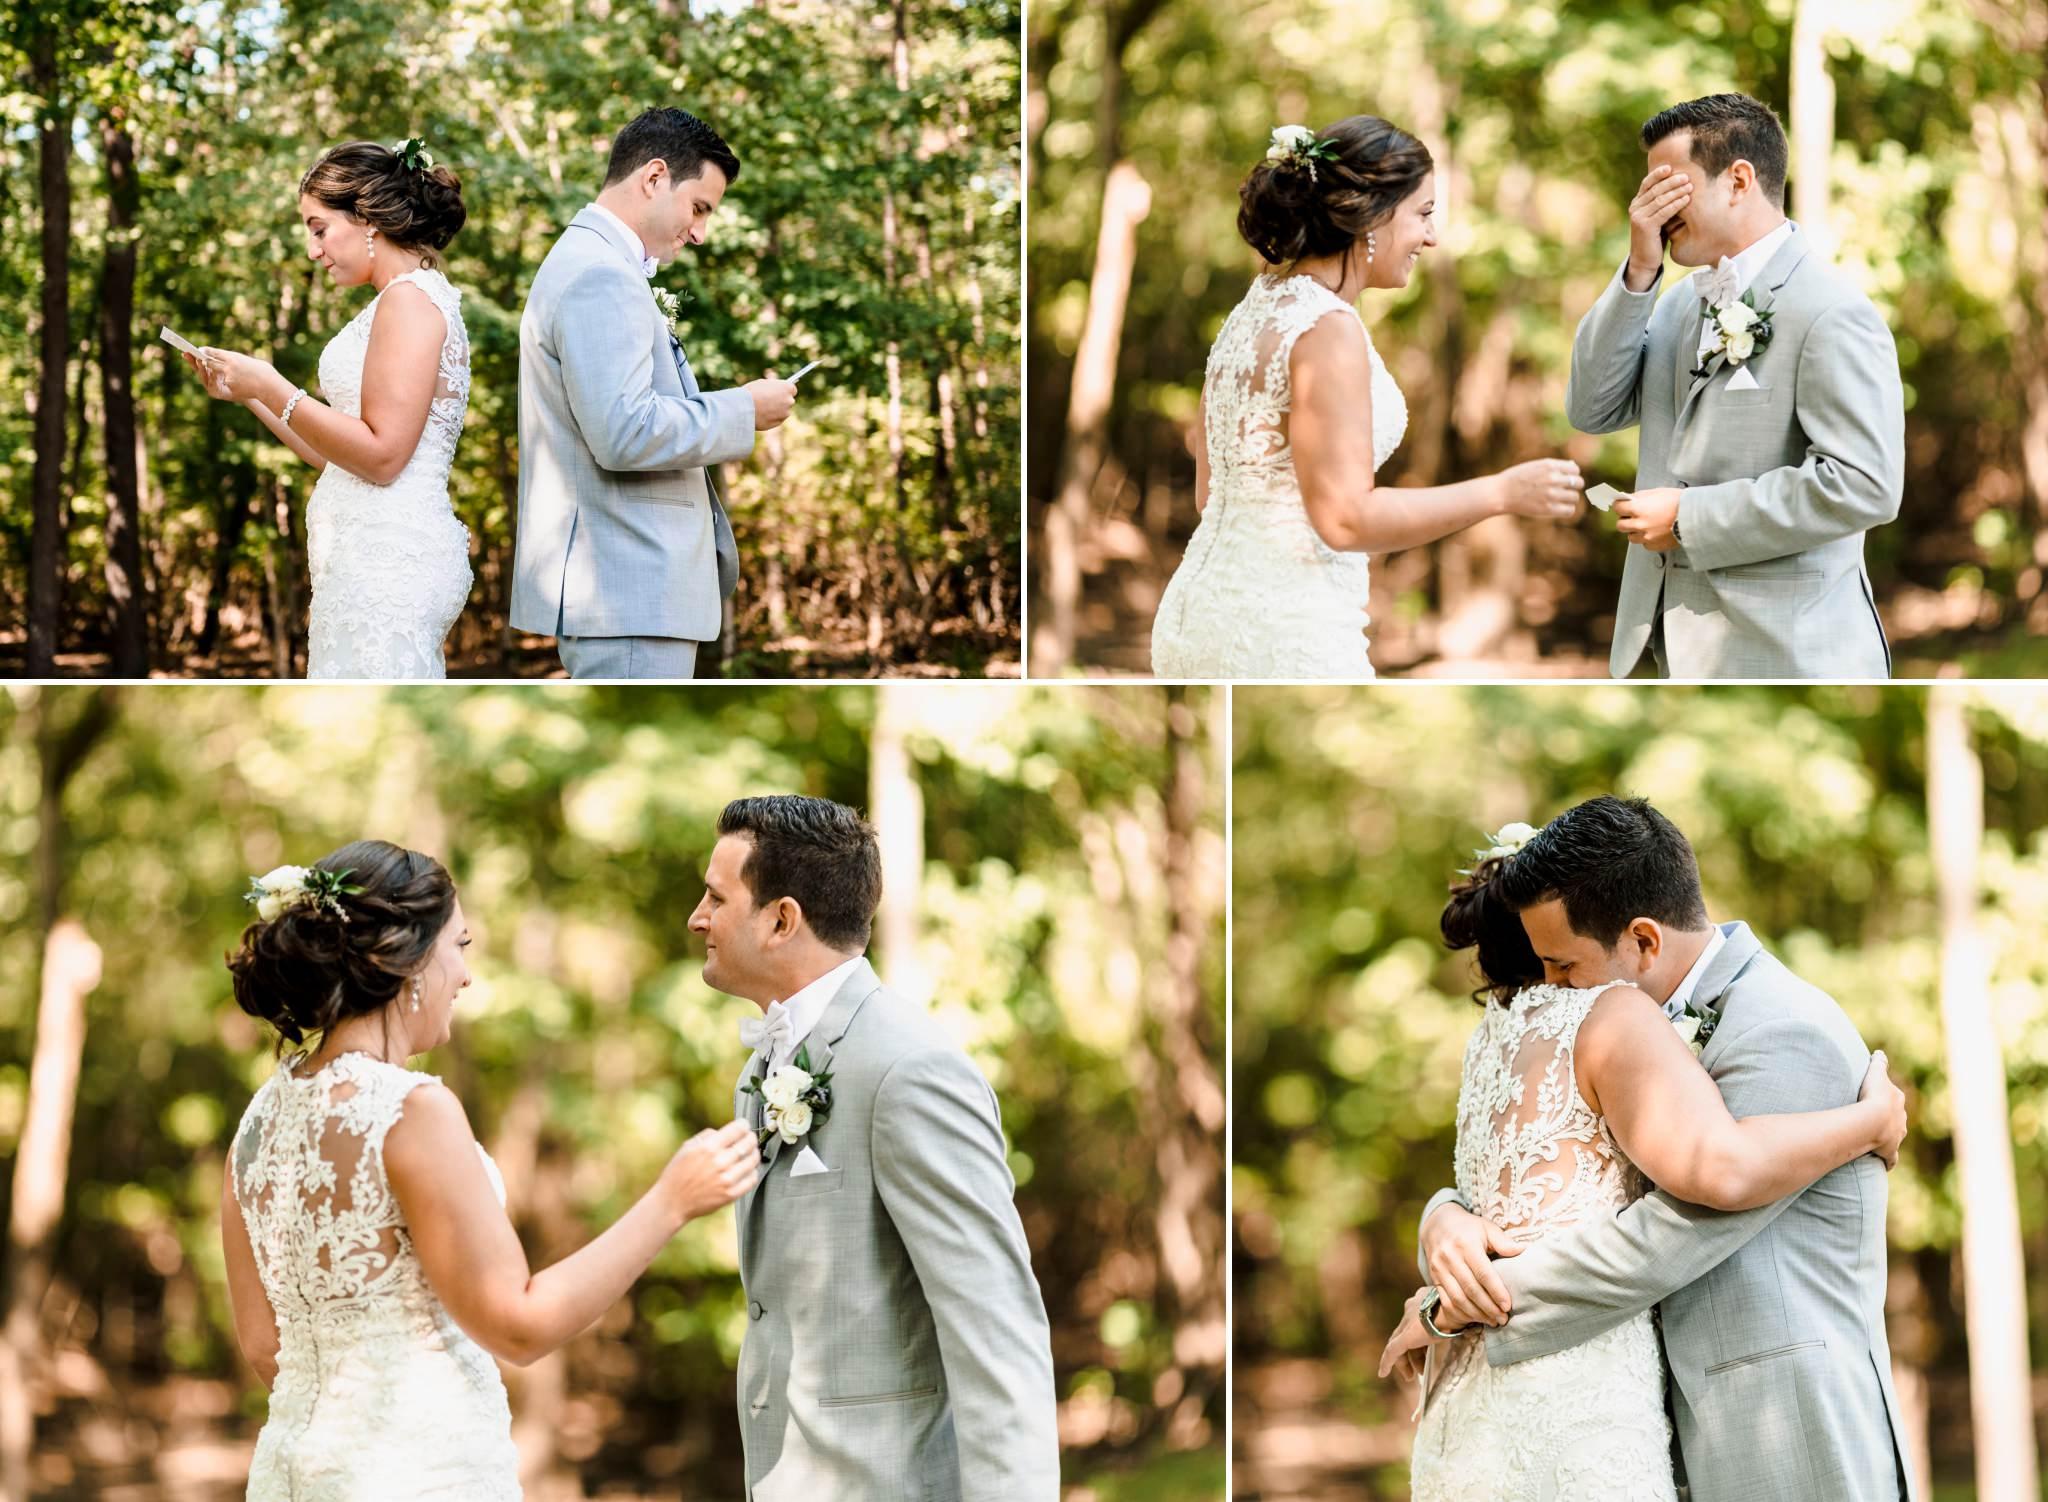 Gilbert-Brigalias-NJ-Wedding-Photographer-54.JPG